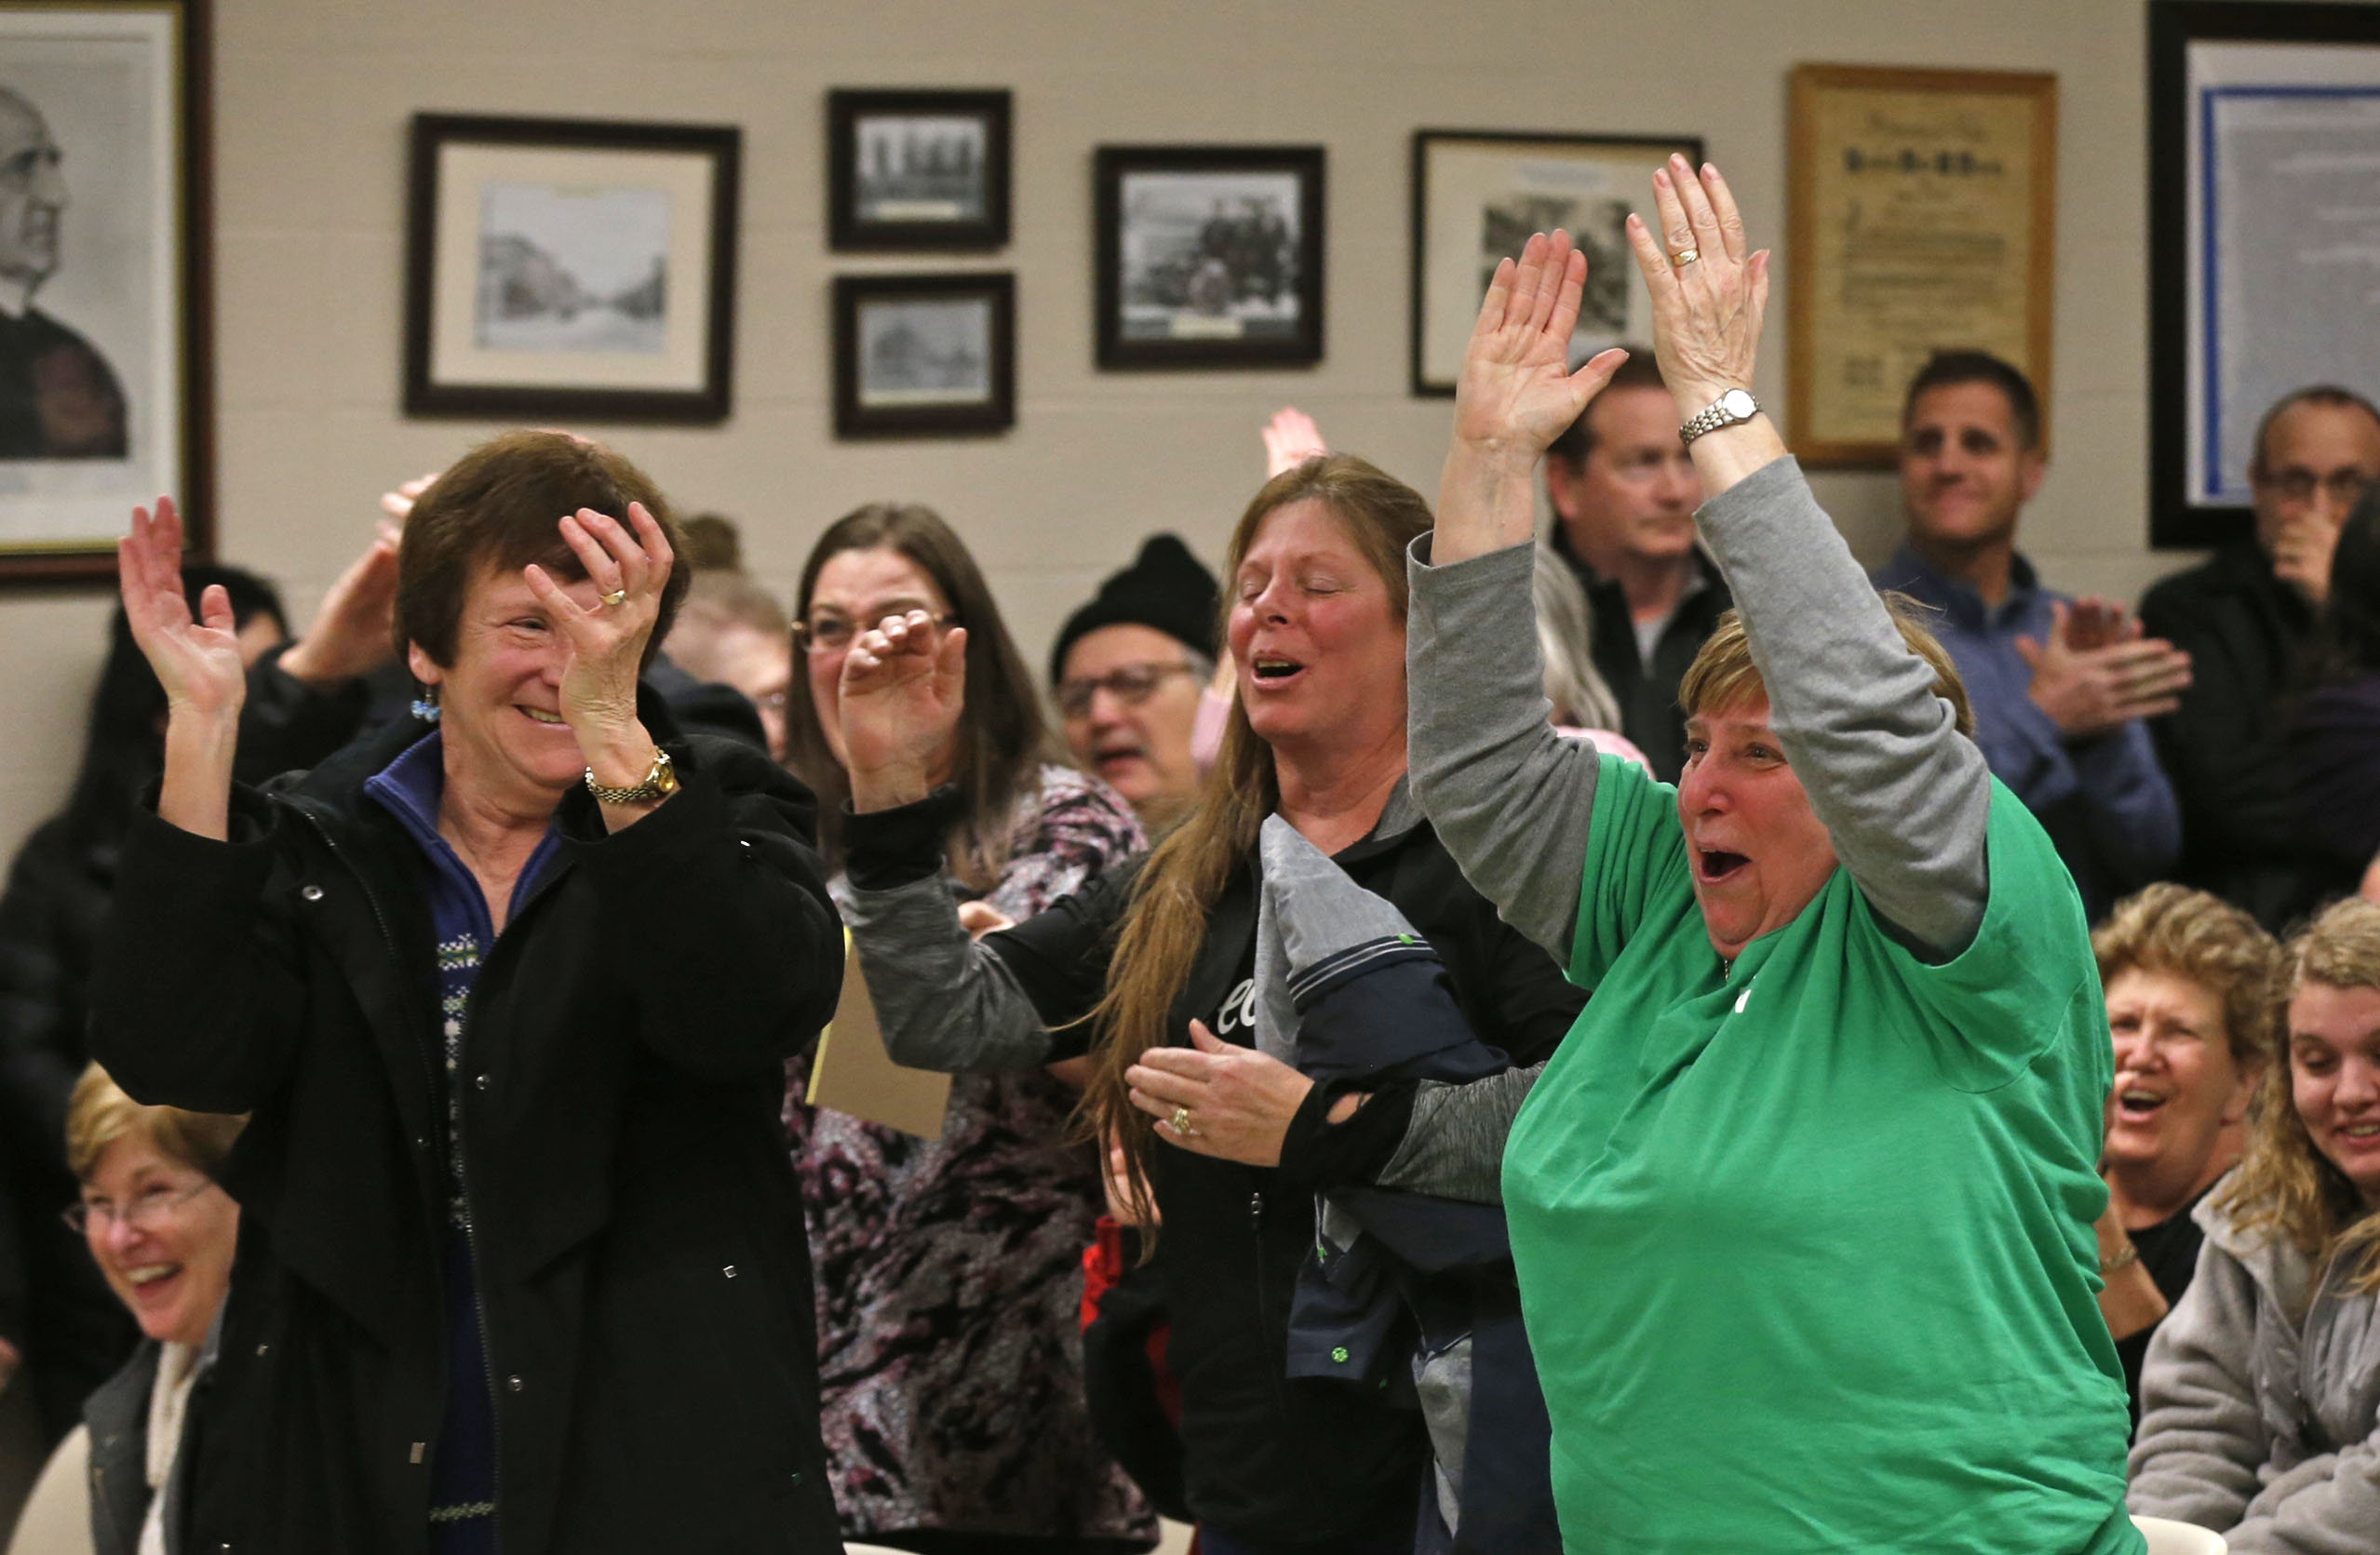 Depew residents celebrate rejection of the effort to dissolve the village. (Robert Kirkham/Buffalo News)